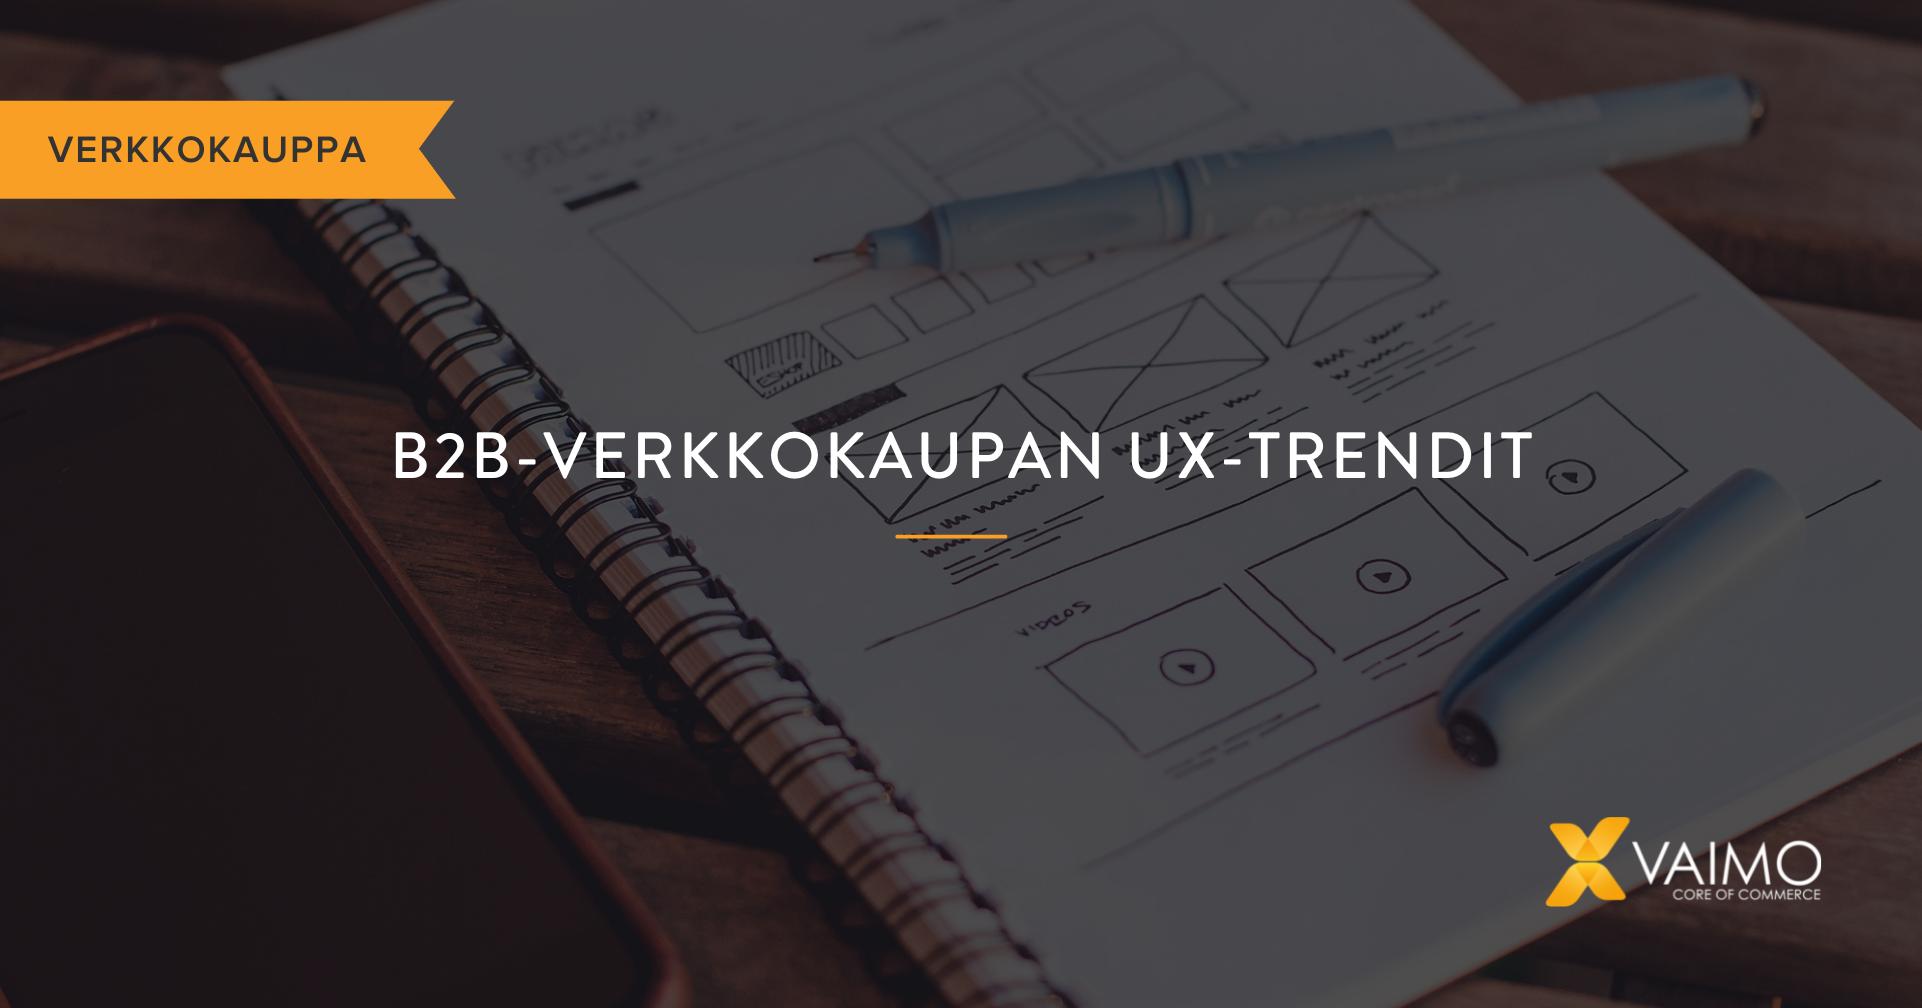 B2B-verkkokaupan UX-trendit